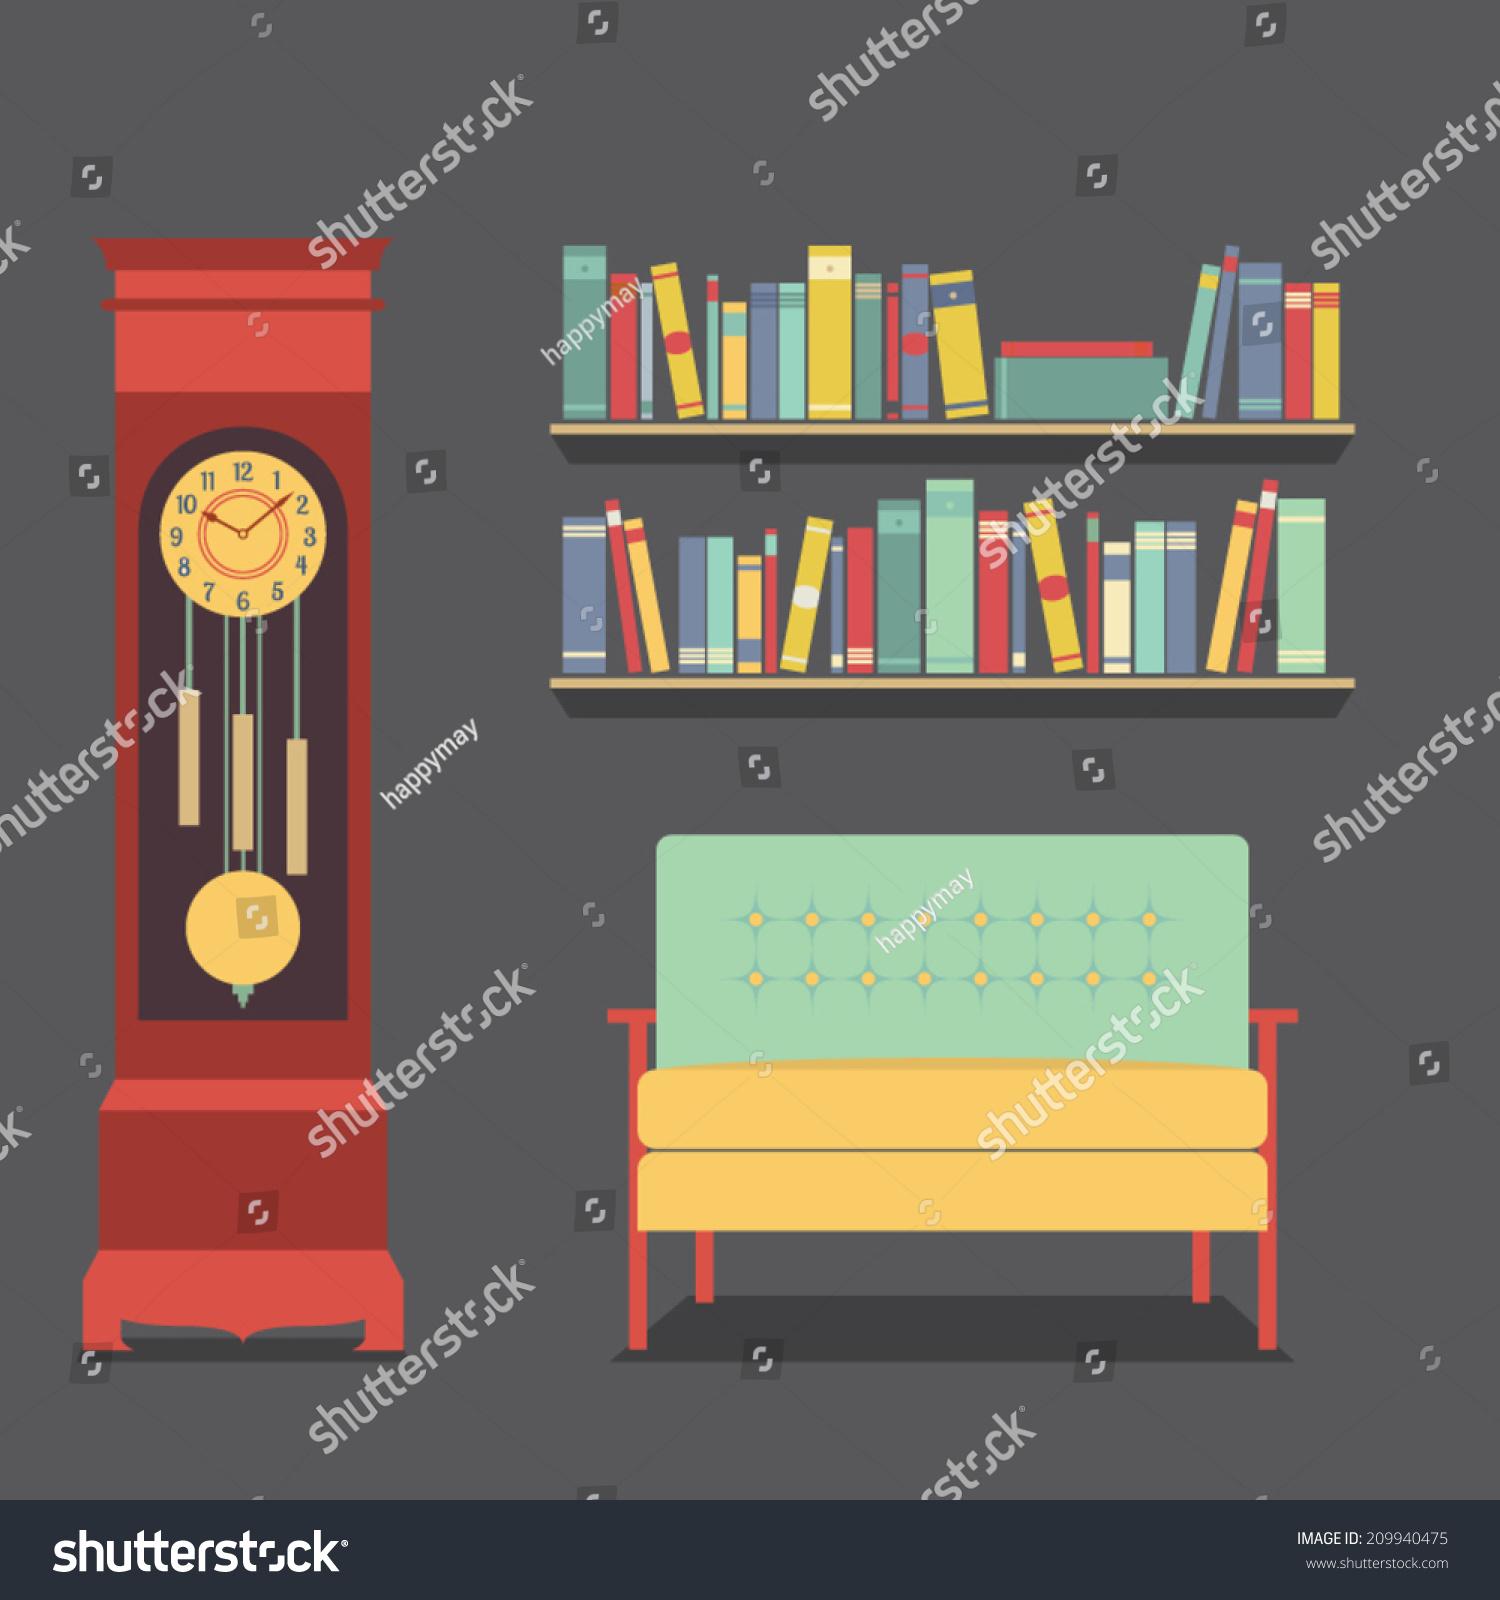 Living room interior design vector illustration stock for Apartment design vector